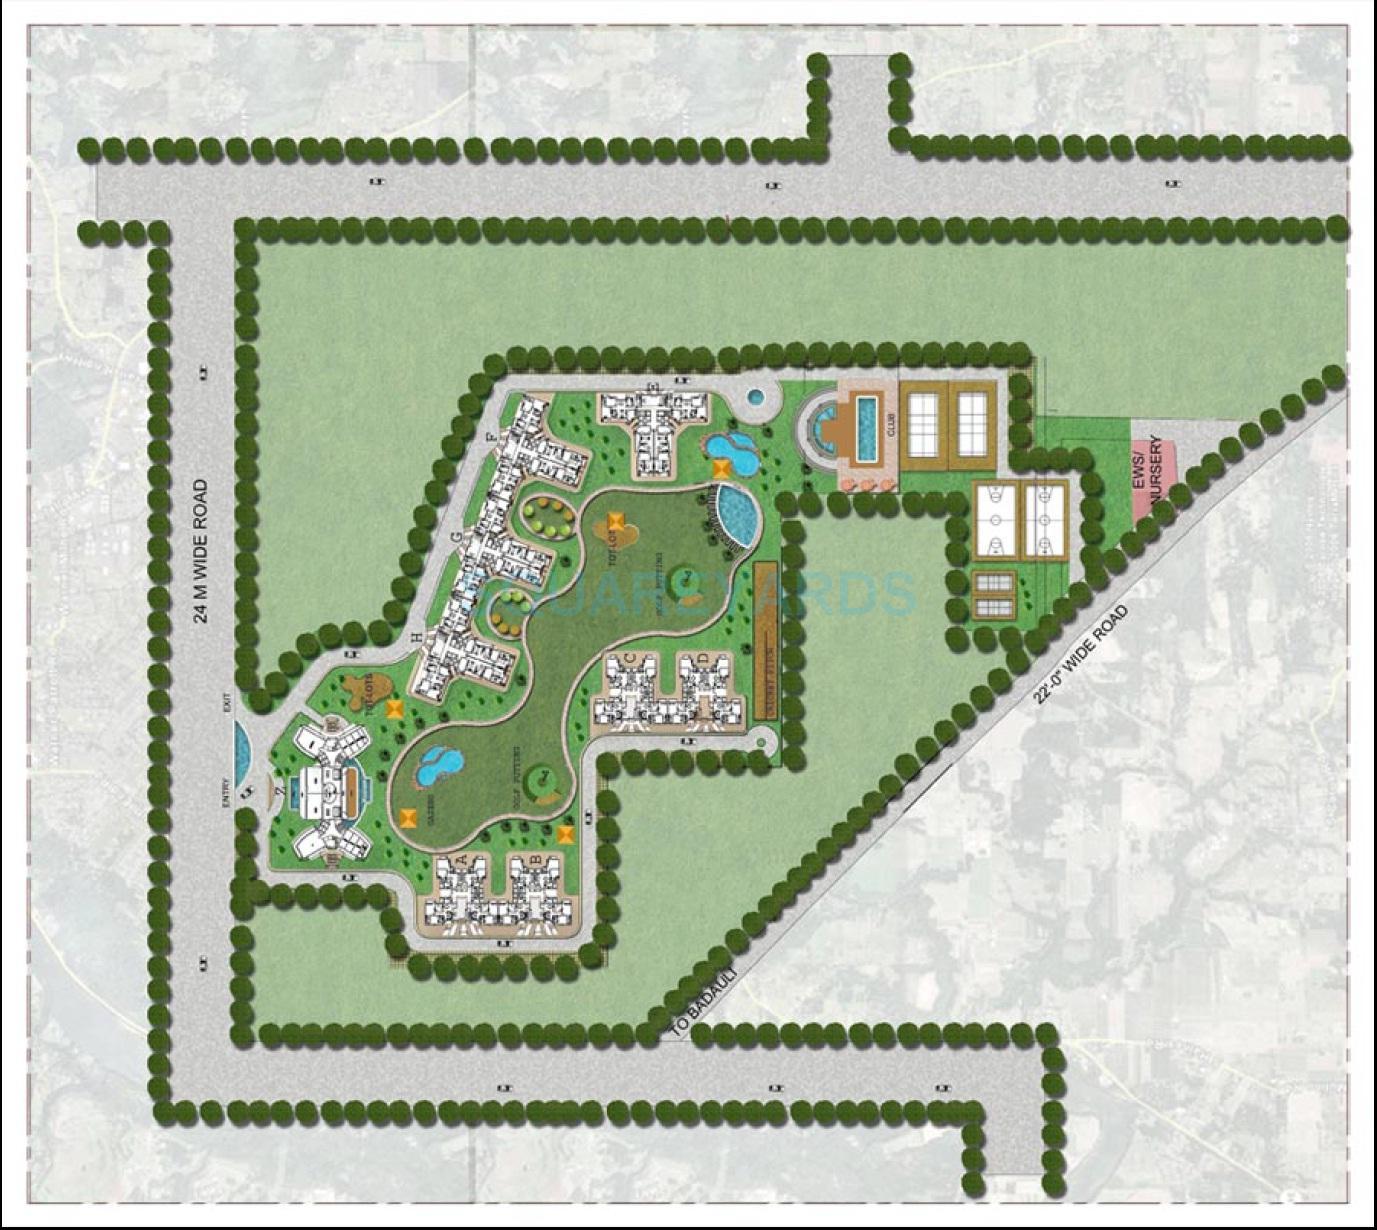 bptp park arena master plan image1